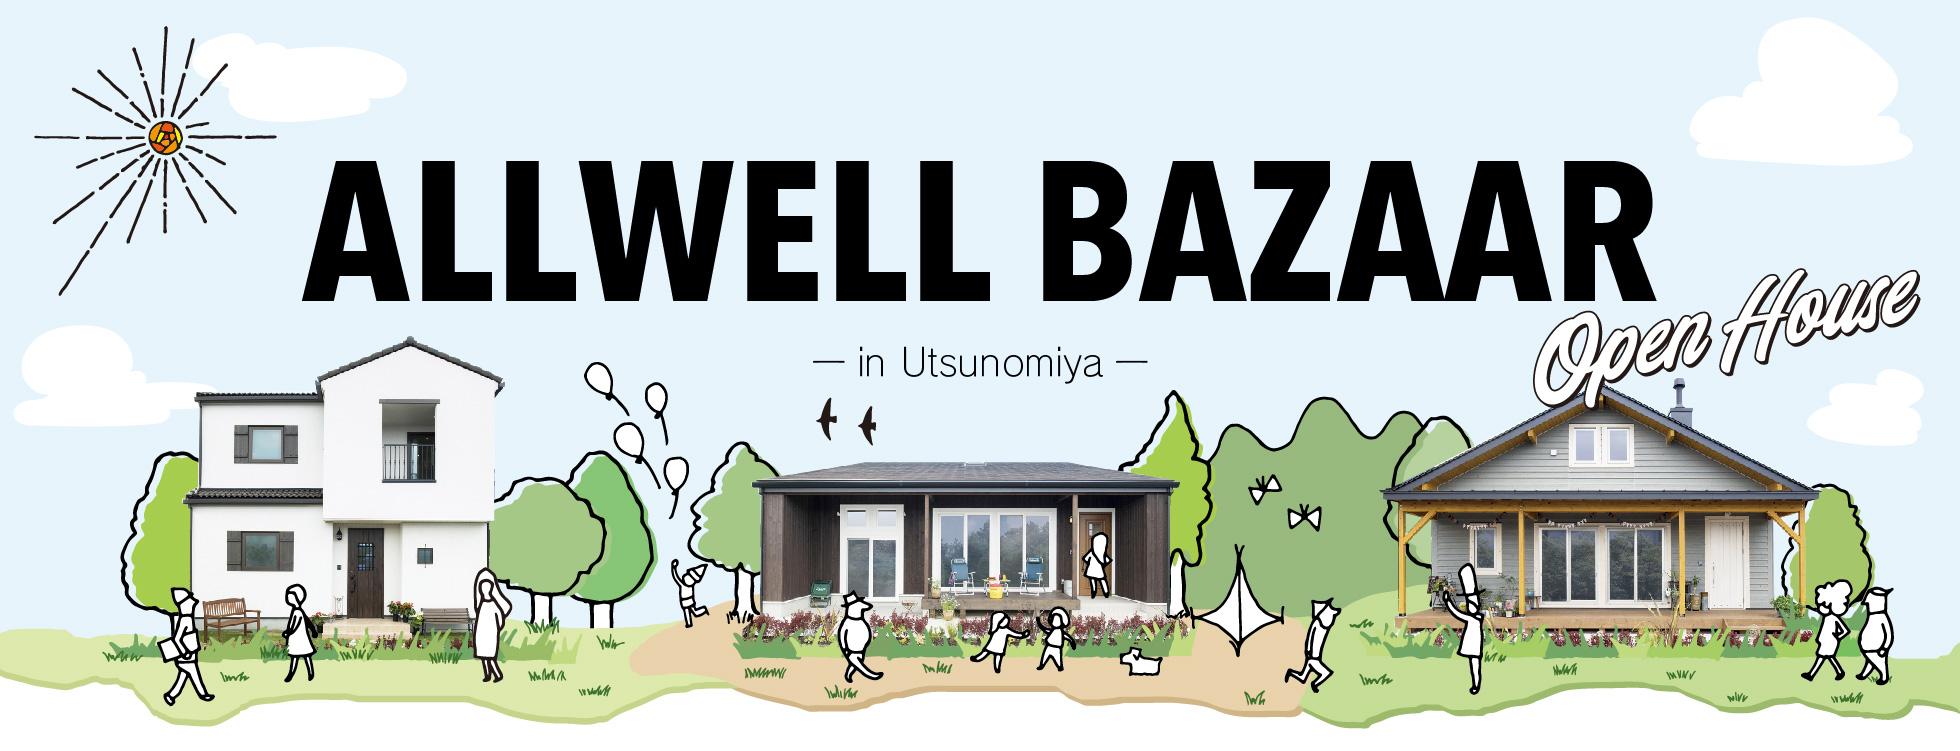 ALLWELL BAZAAR  in宇都宮 2020/1/19に開催決定!